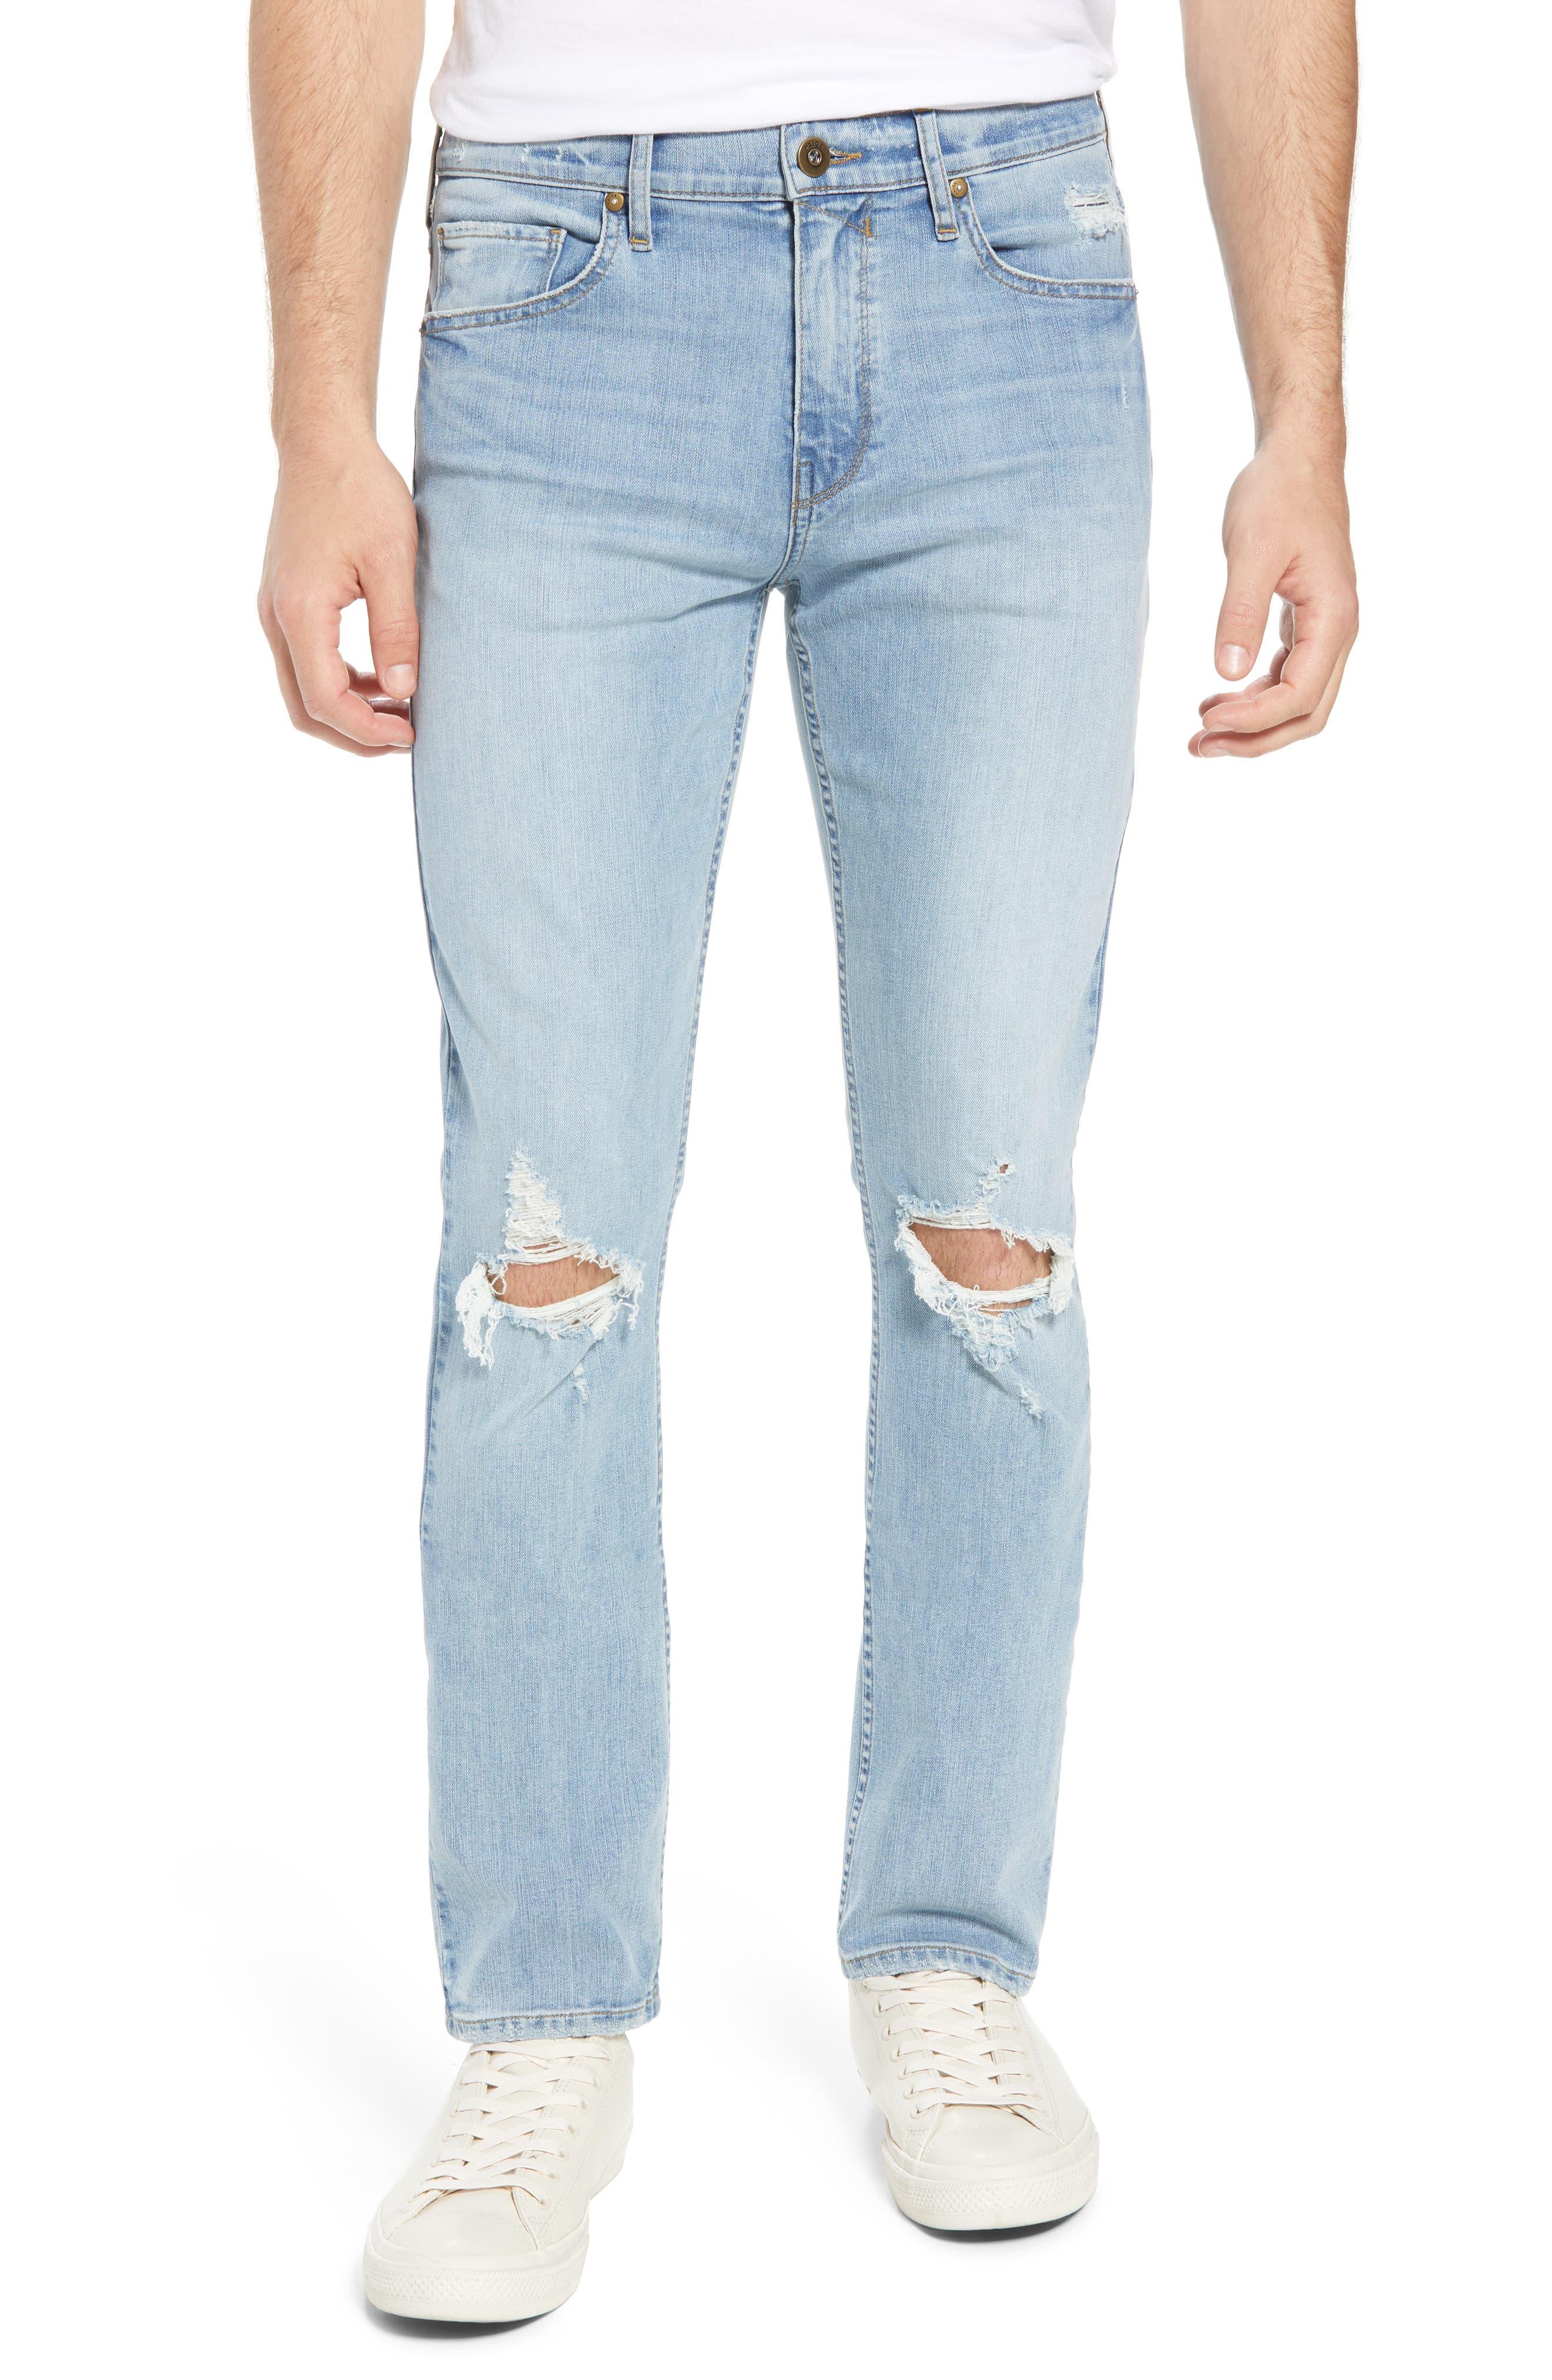 Lennox Slim Fit Jeans,                             Main thumbnail 1, color,                             County Destructed